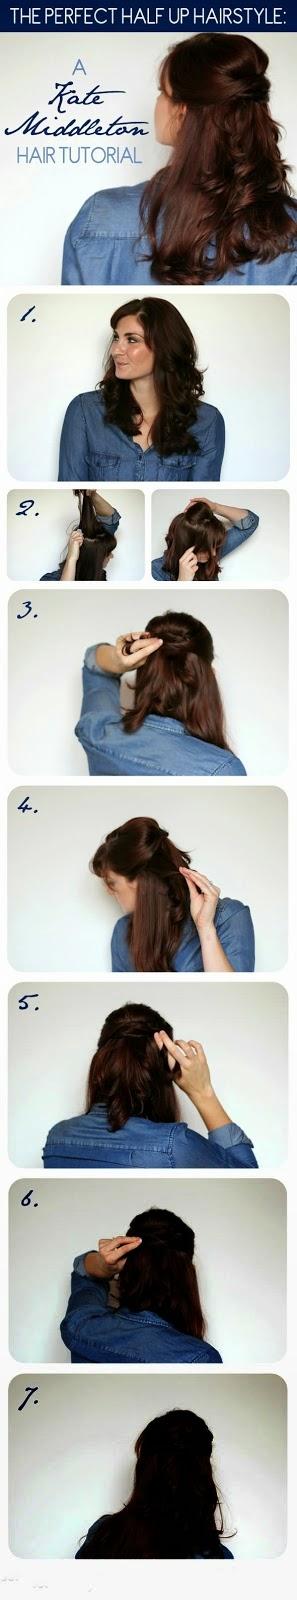 A Kate Middleton Hair Tutorial}